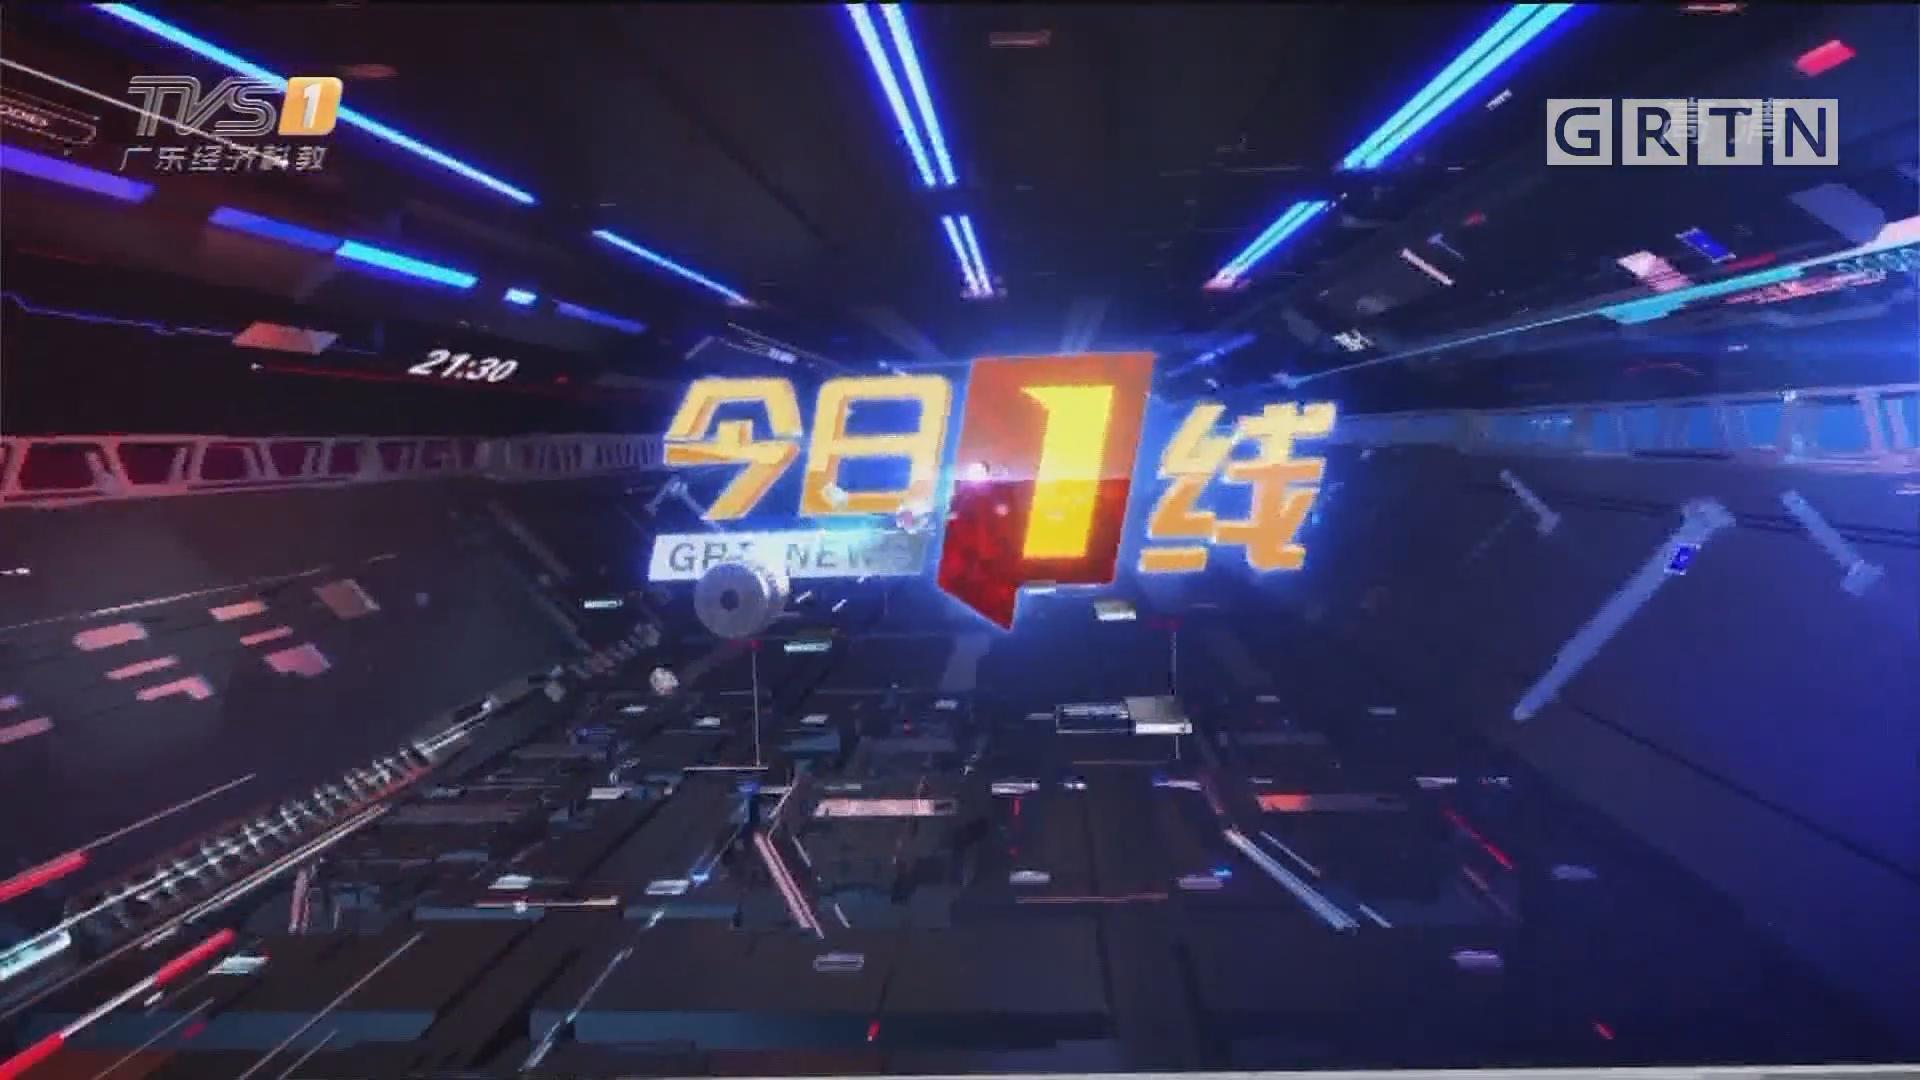 [HD][2019-10-14]今日一线:小吃店消防隐患调查 煲仔饭店:煤气管随地交错乱放